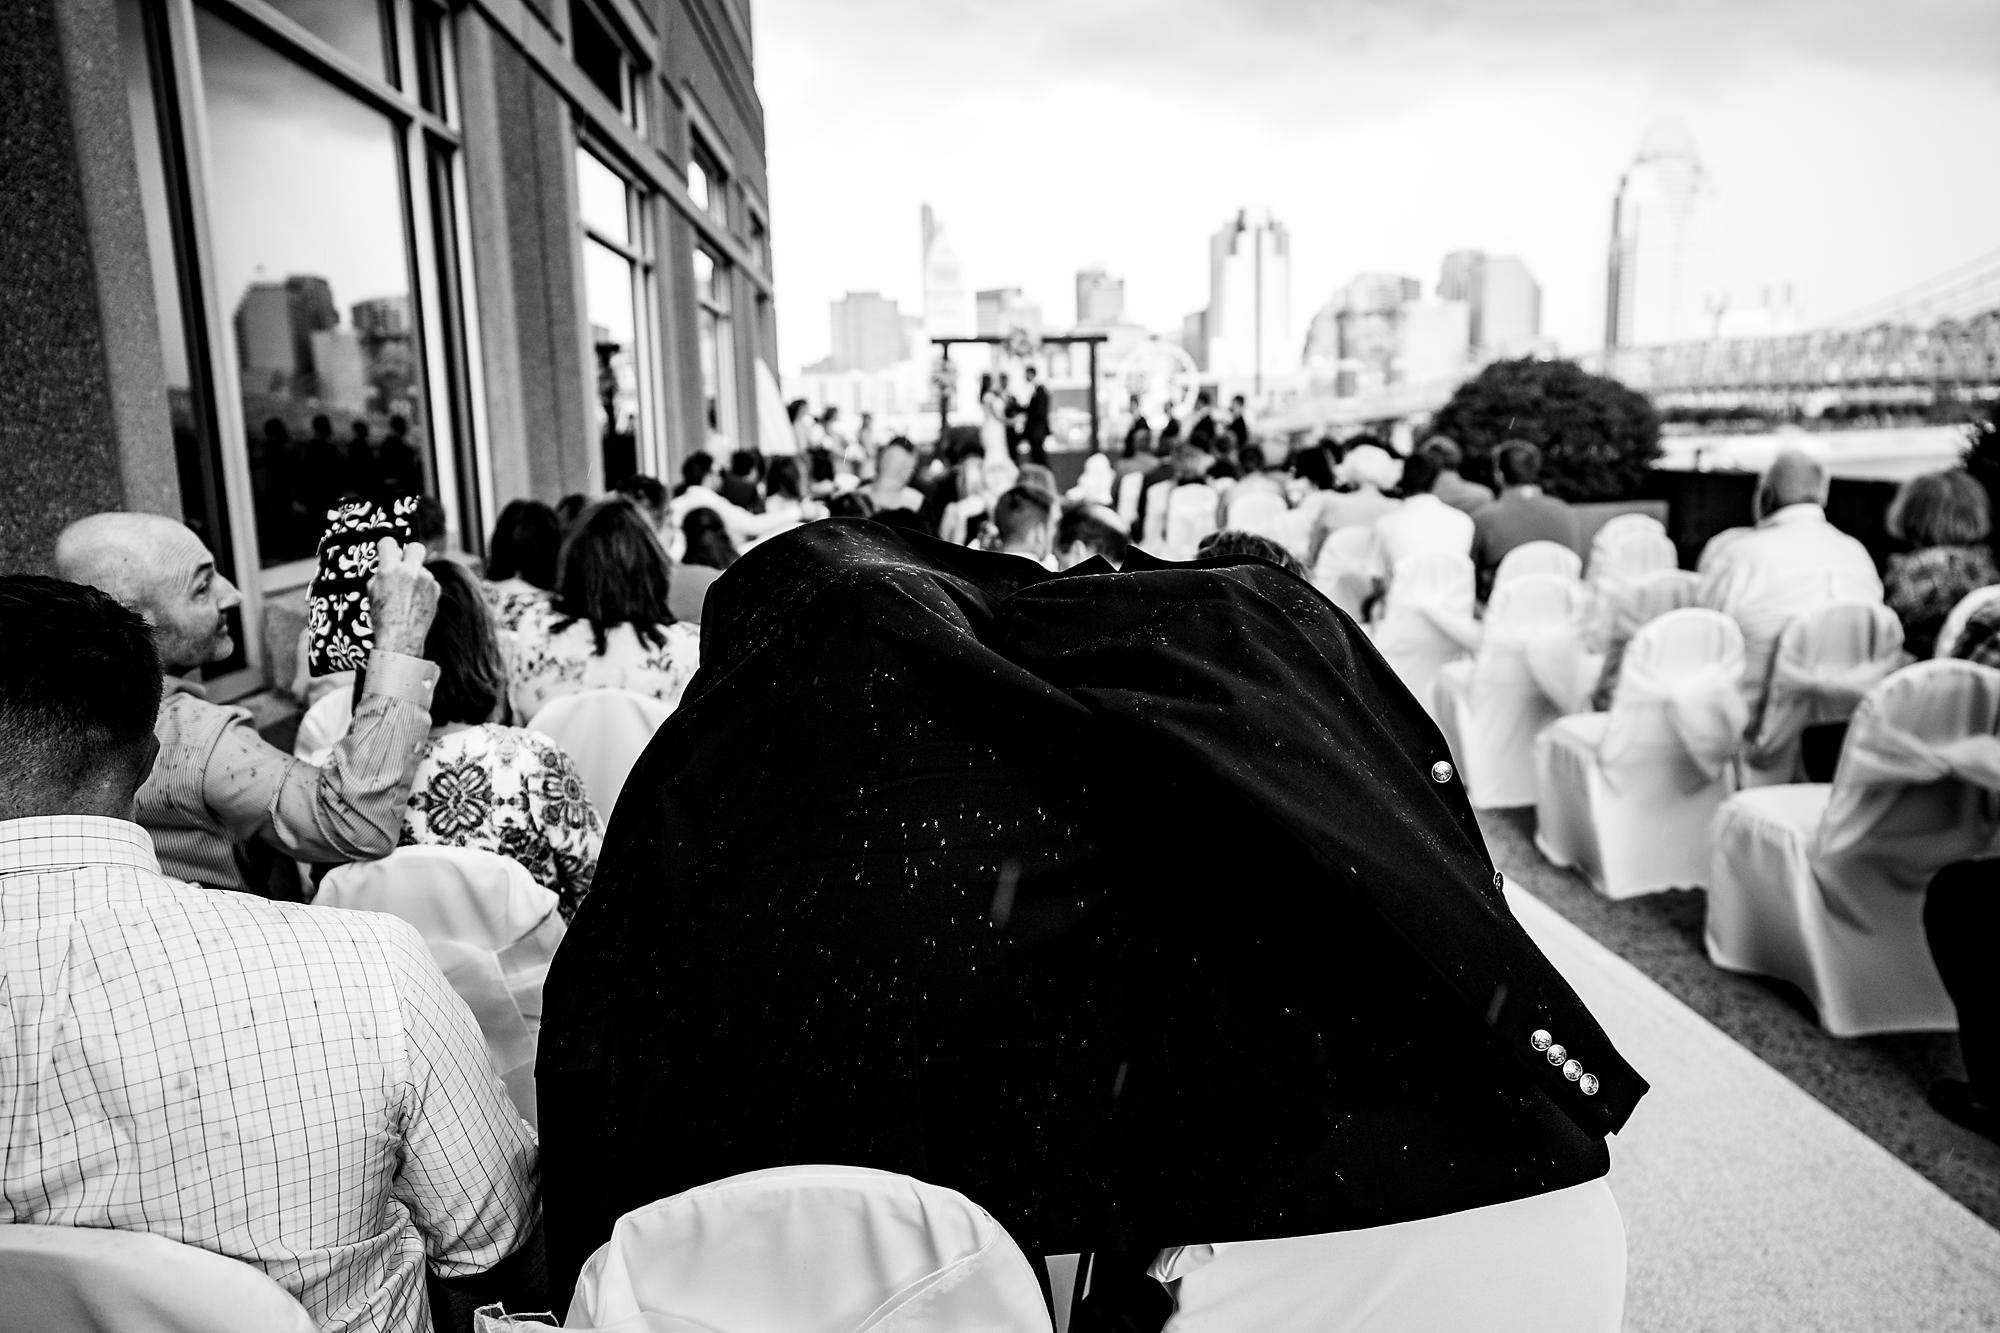 Embassy-Suites-Rivercenter-Wedding-Photography-22.jpg